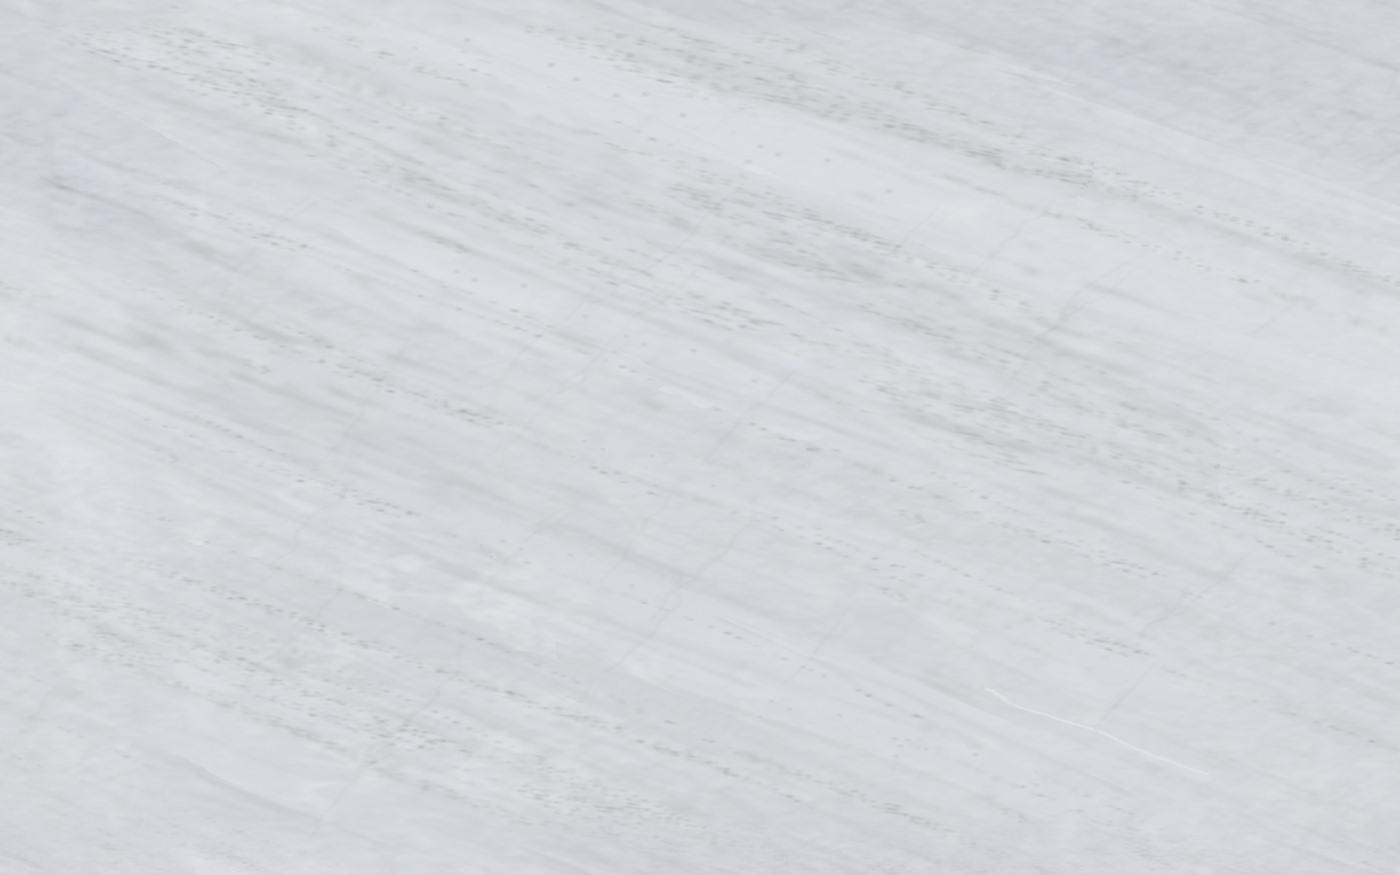 White Marble Texture : Swtexture free architectural textures white marble